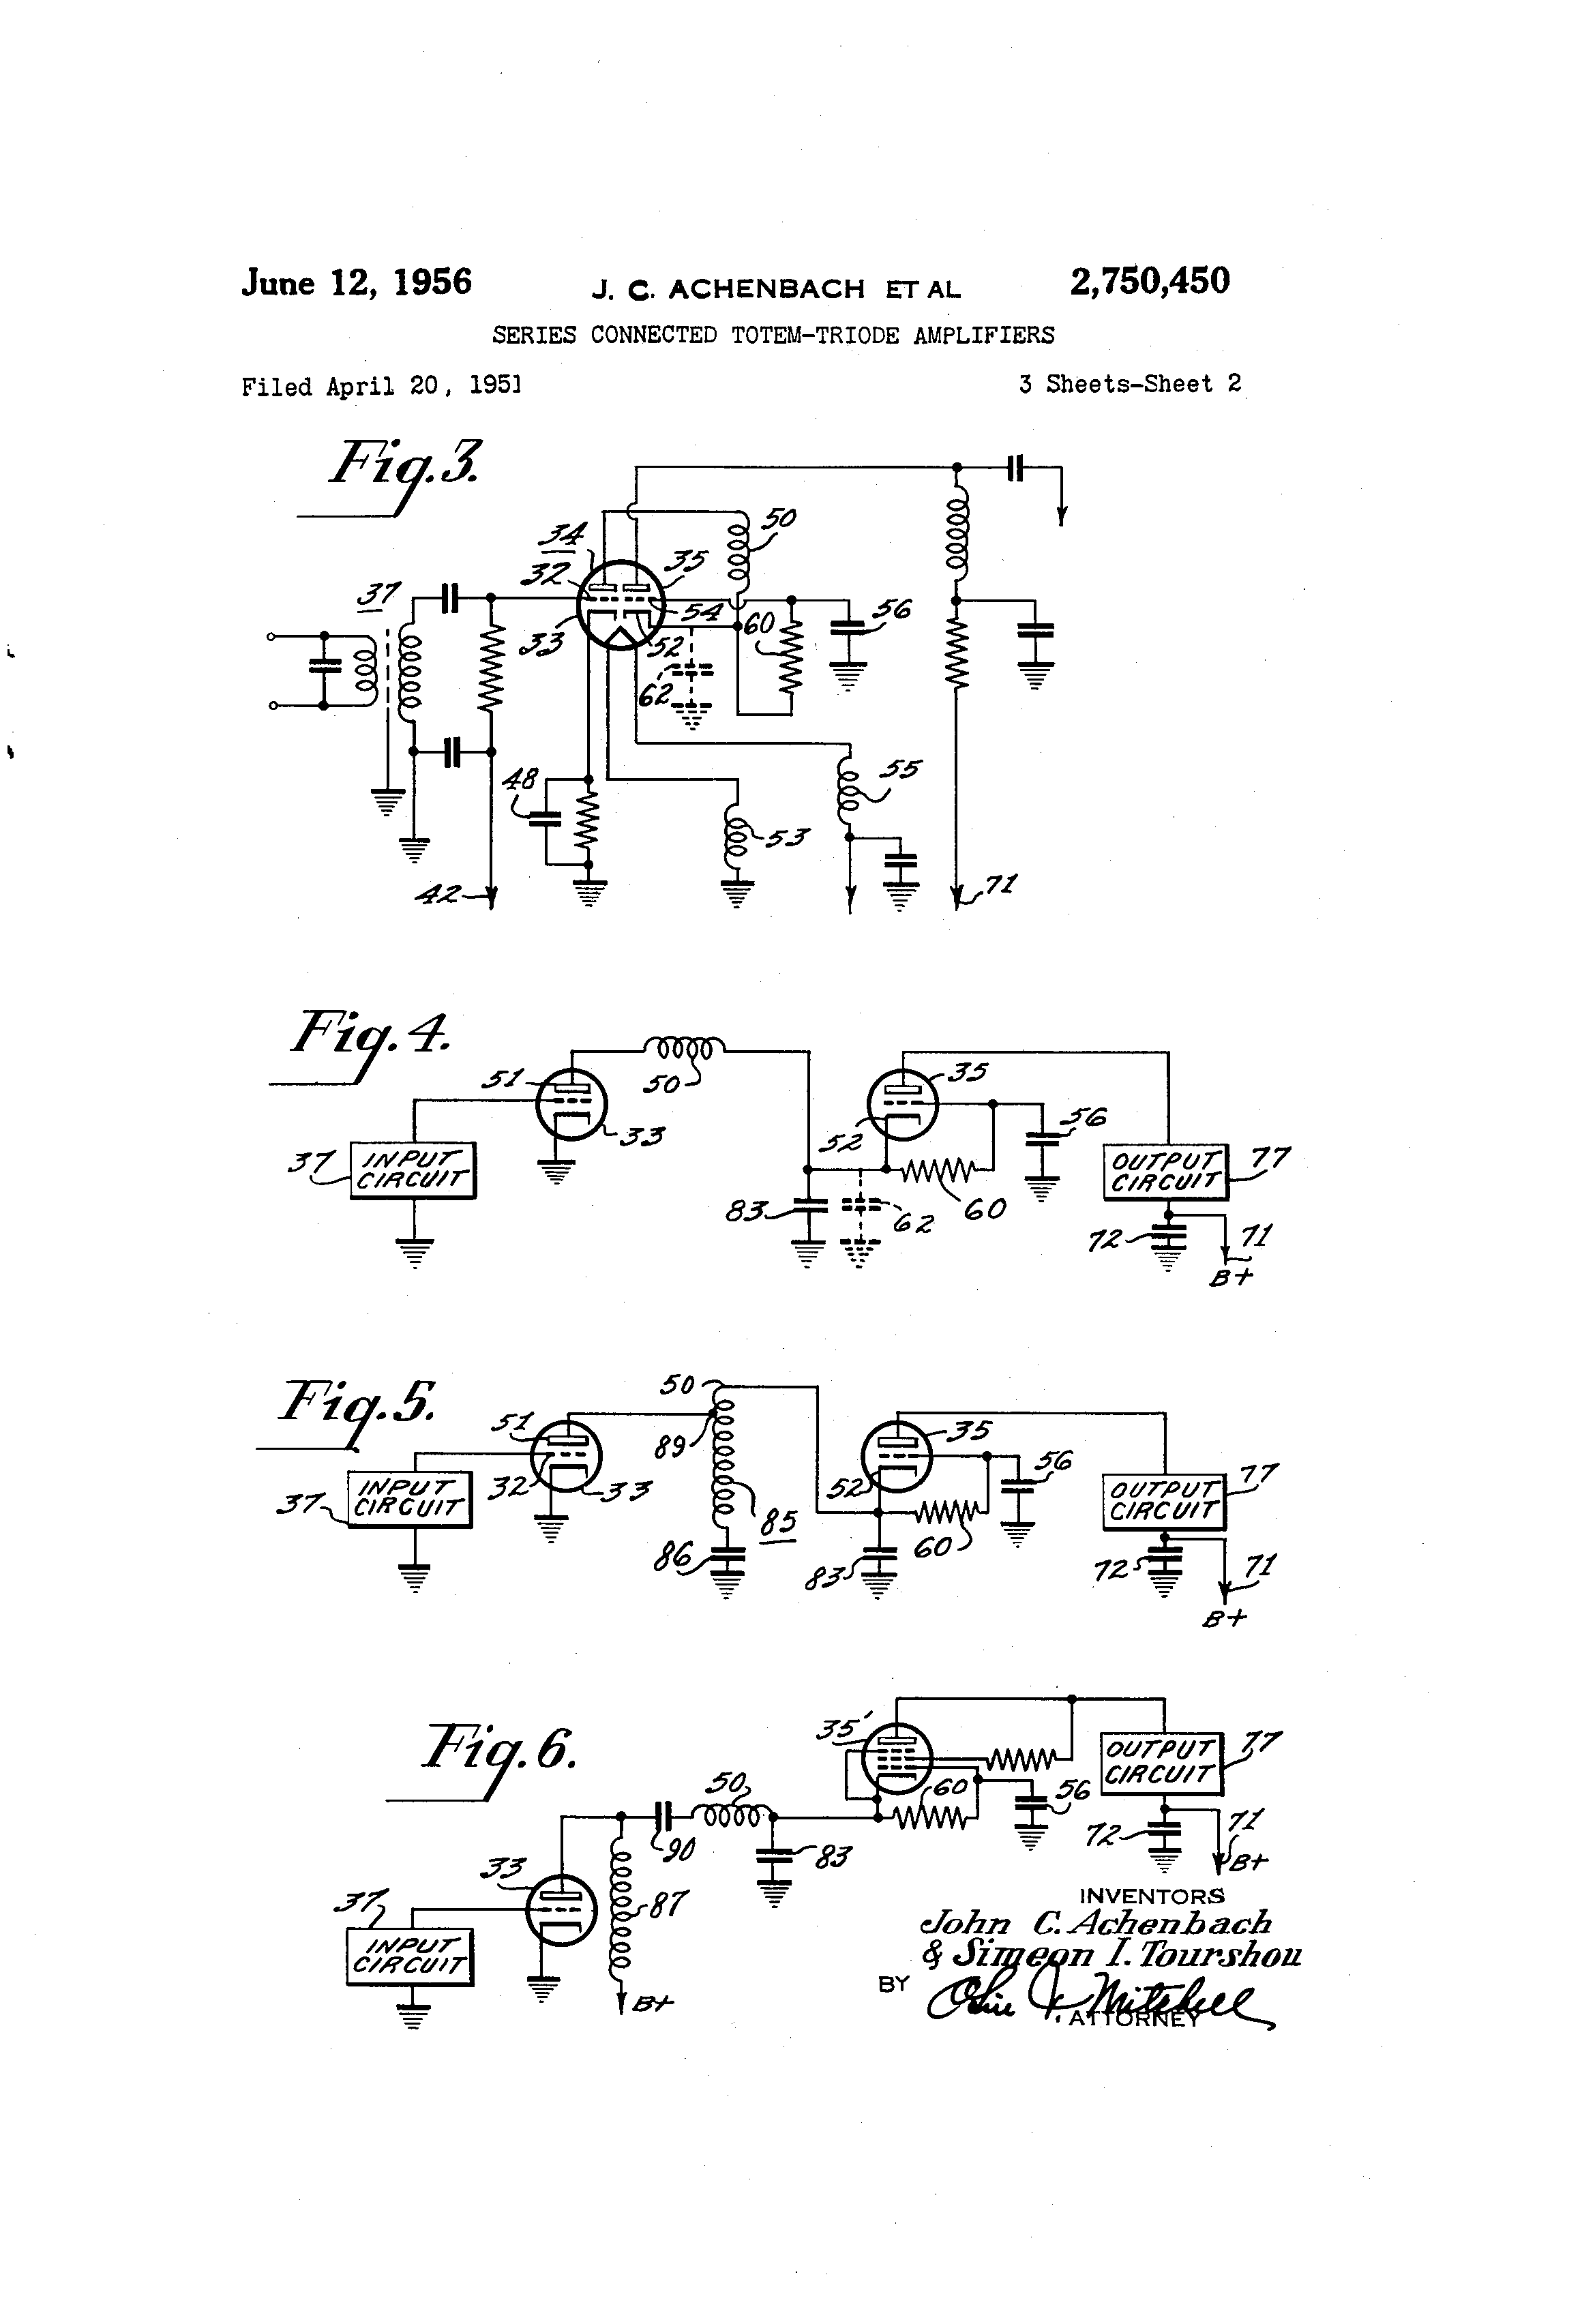 Brevet Us2750450 Series Connected Totem Triode Amplifiers Google Shunt Pair Wideband Amplifier Brevets